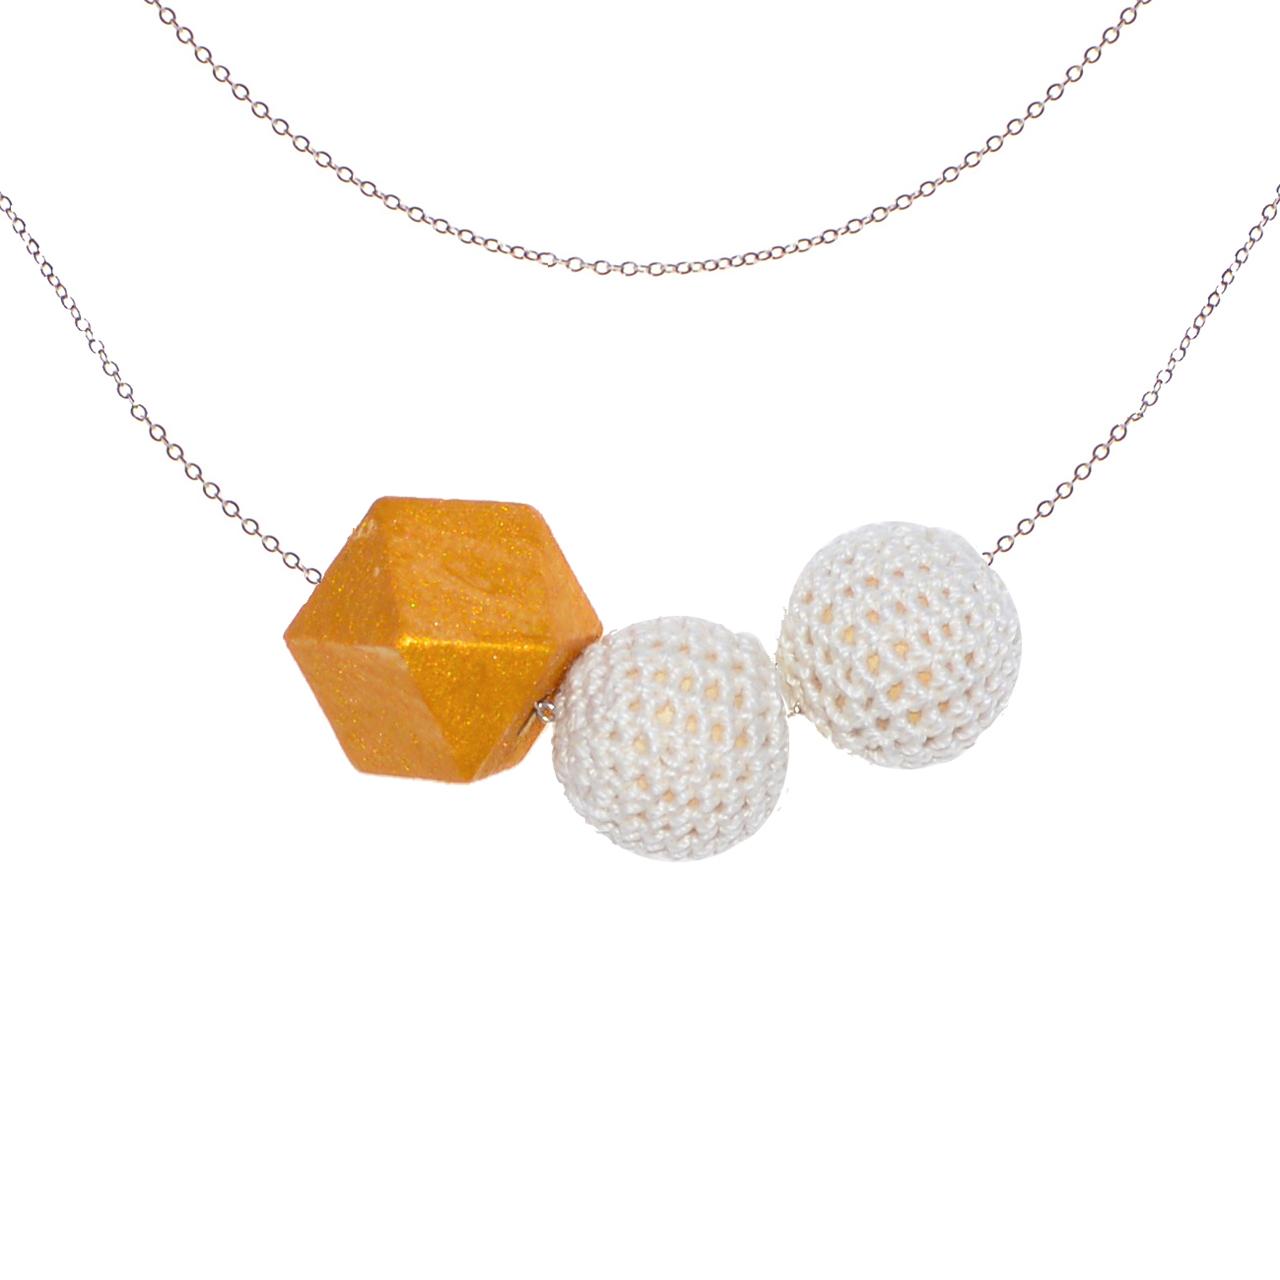 Mon Bijou - Necklace Night Out 3 white | The Design Gift Shop